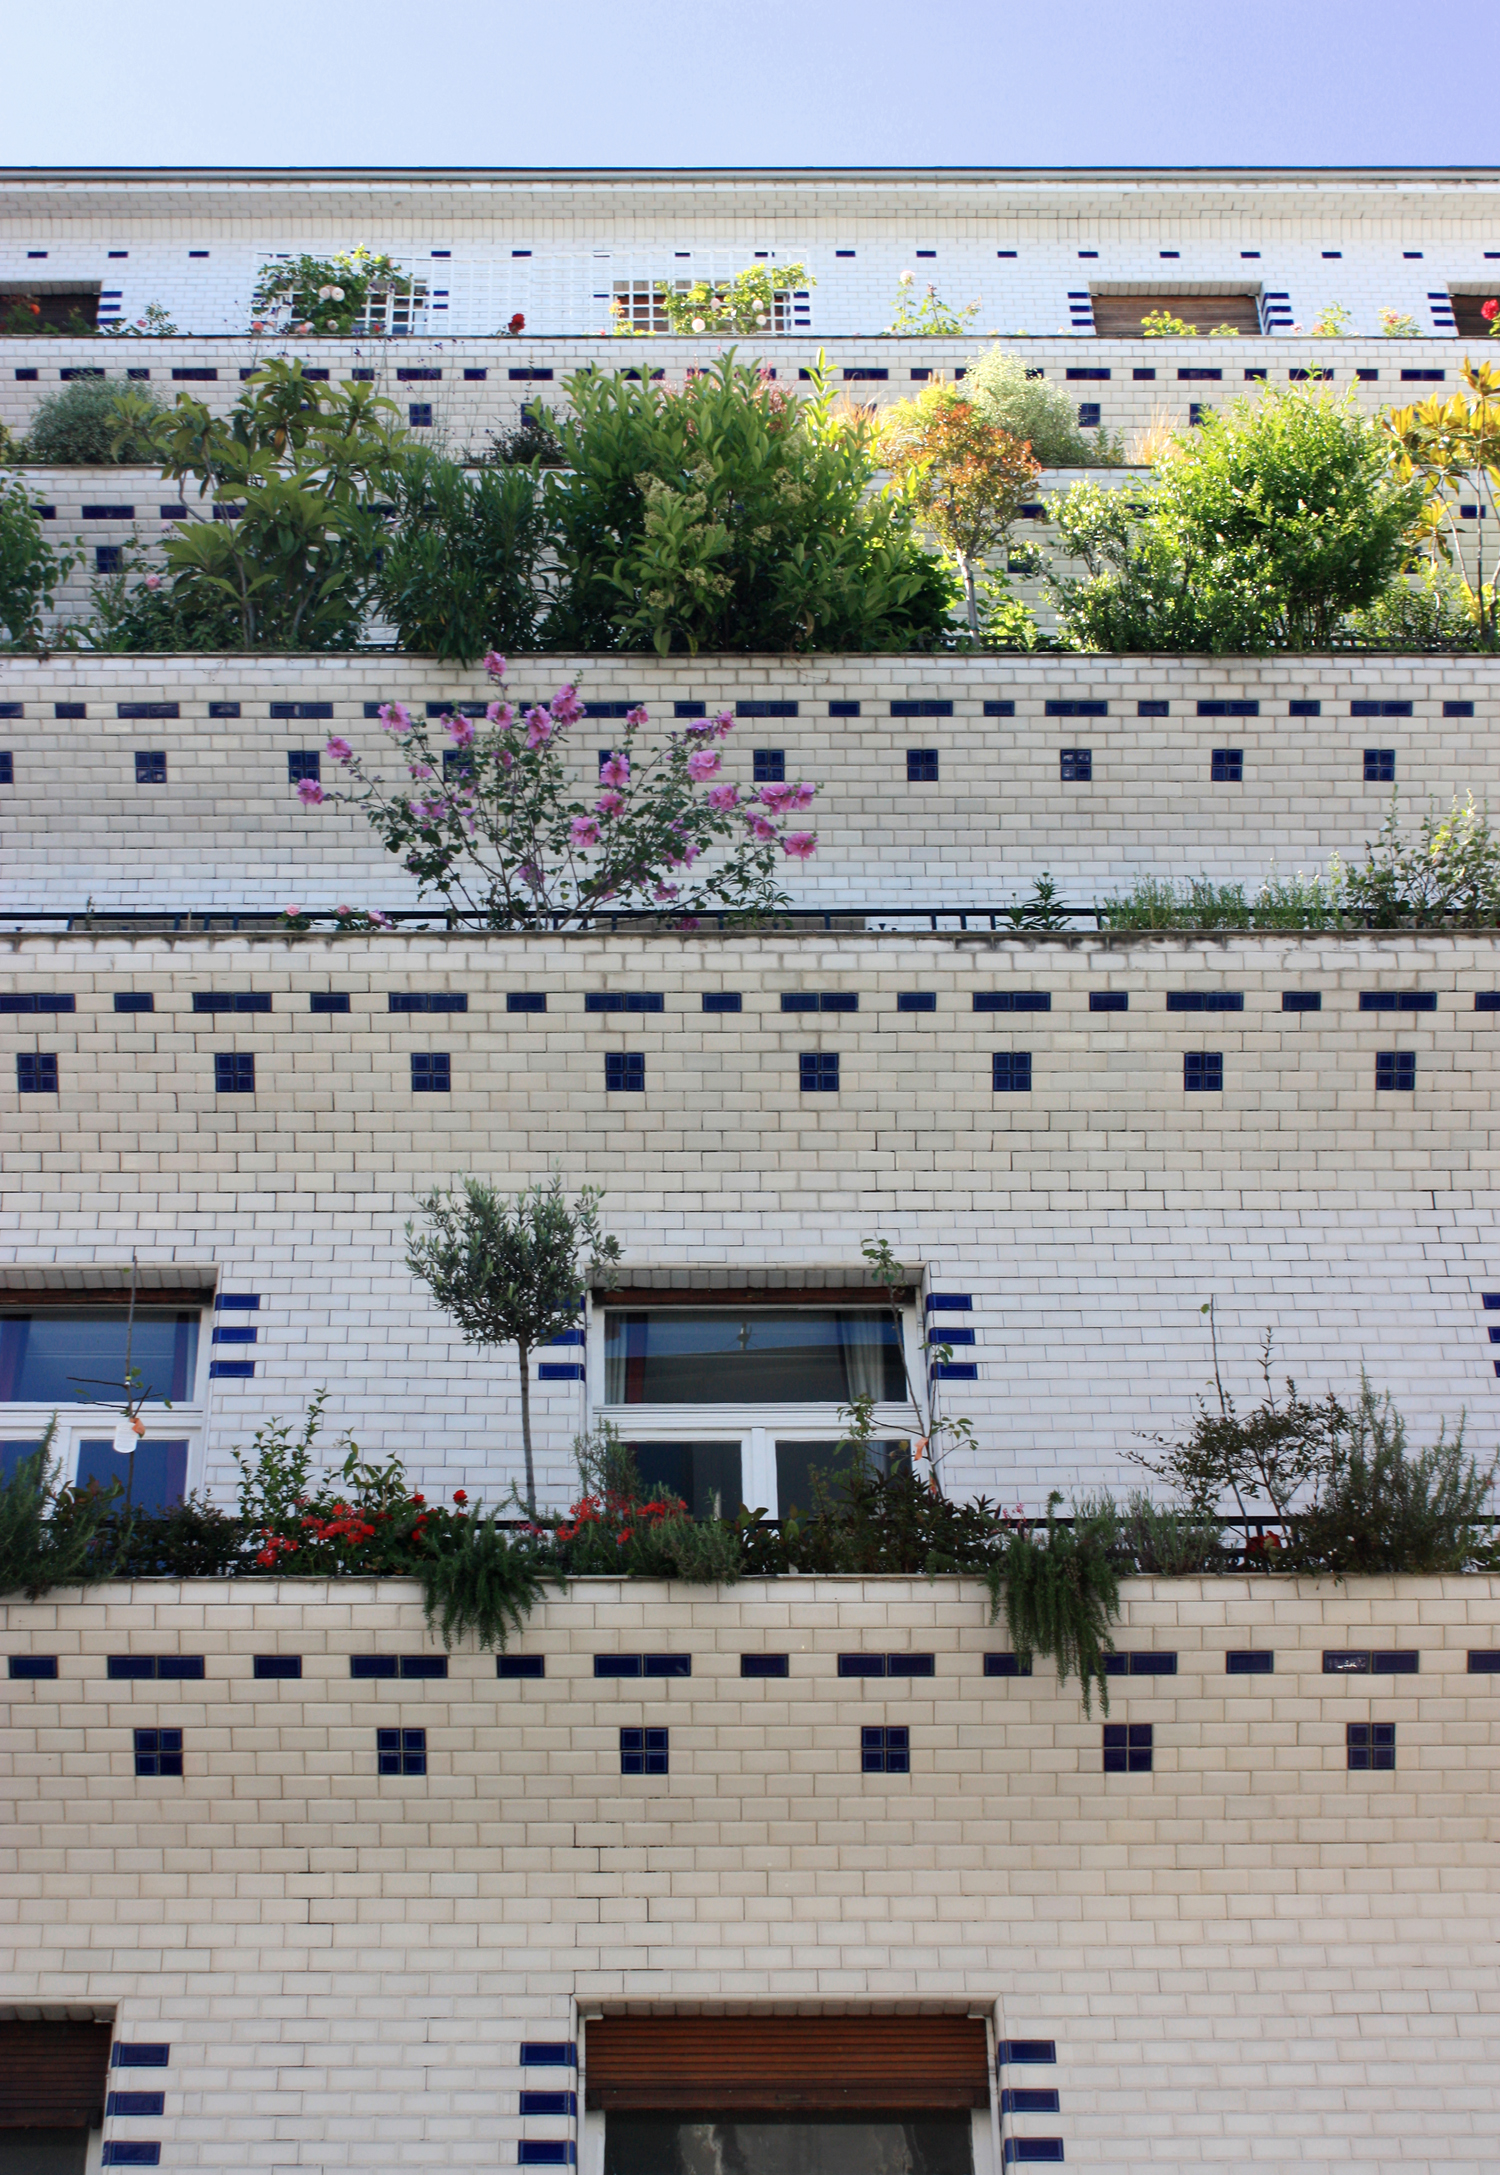 Archigraphie_Sauvage_Henri_Immeuble_gradins_Vavin_03